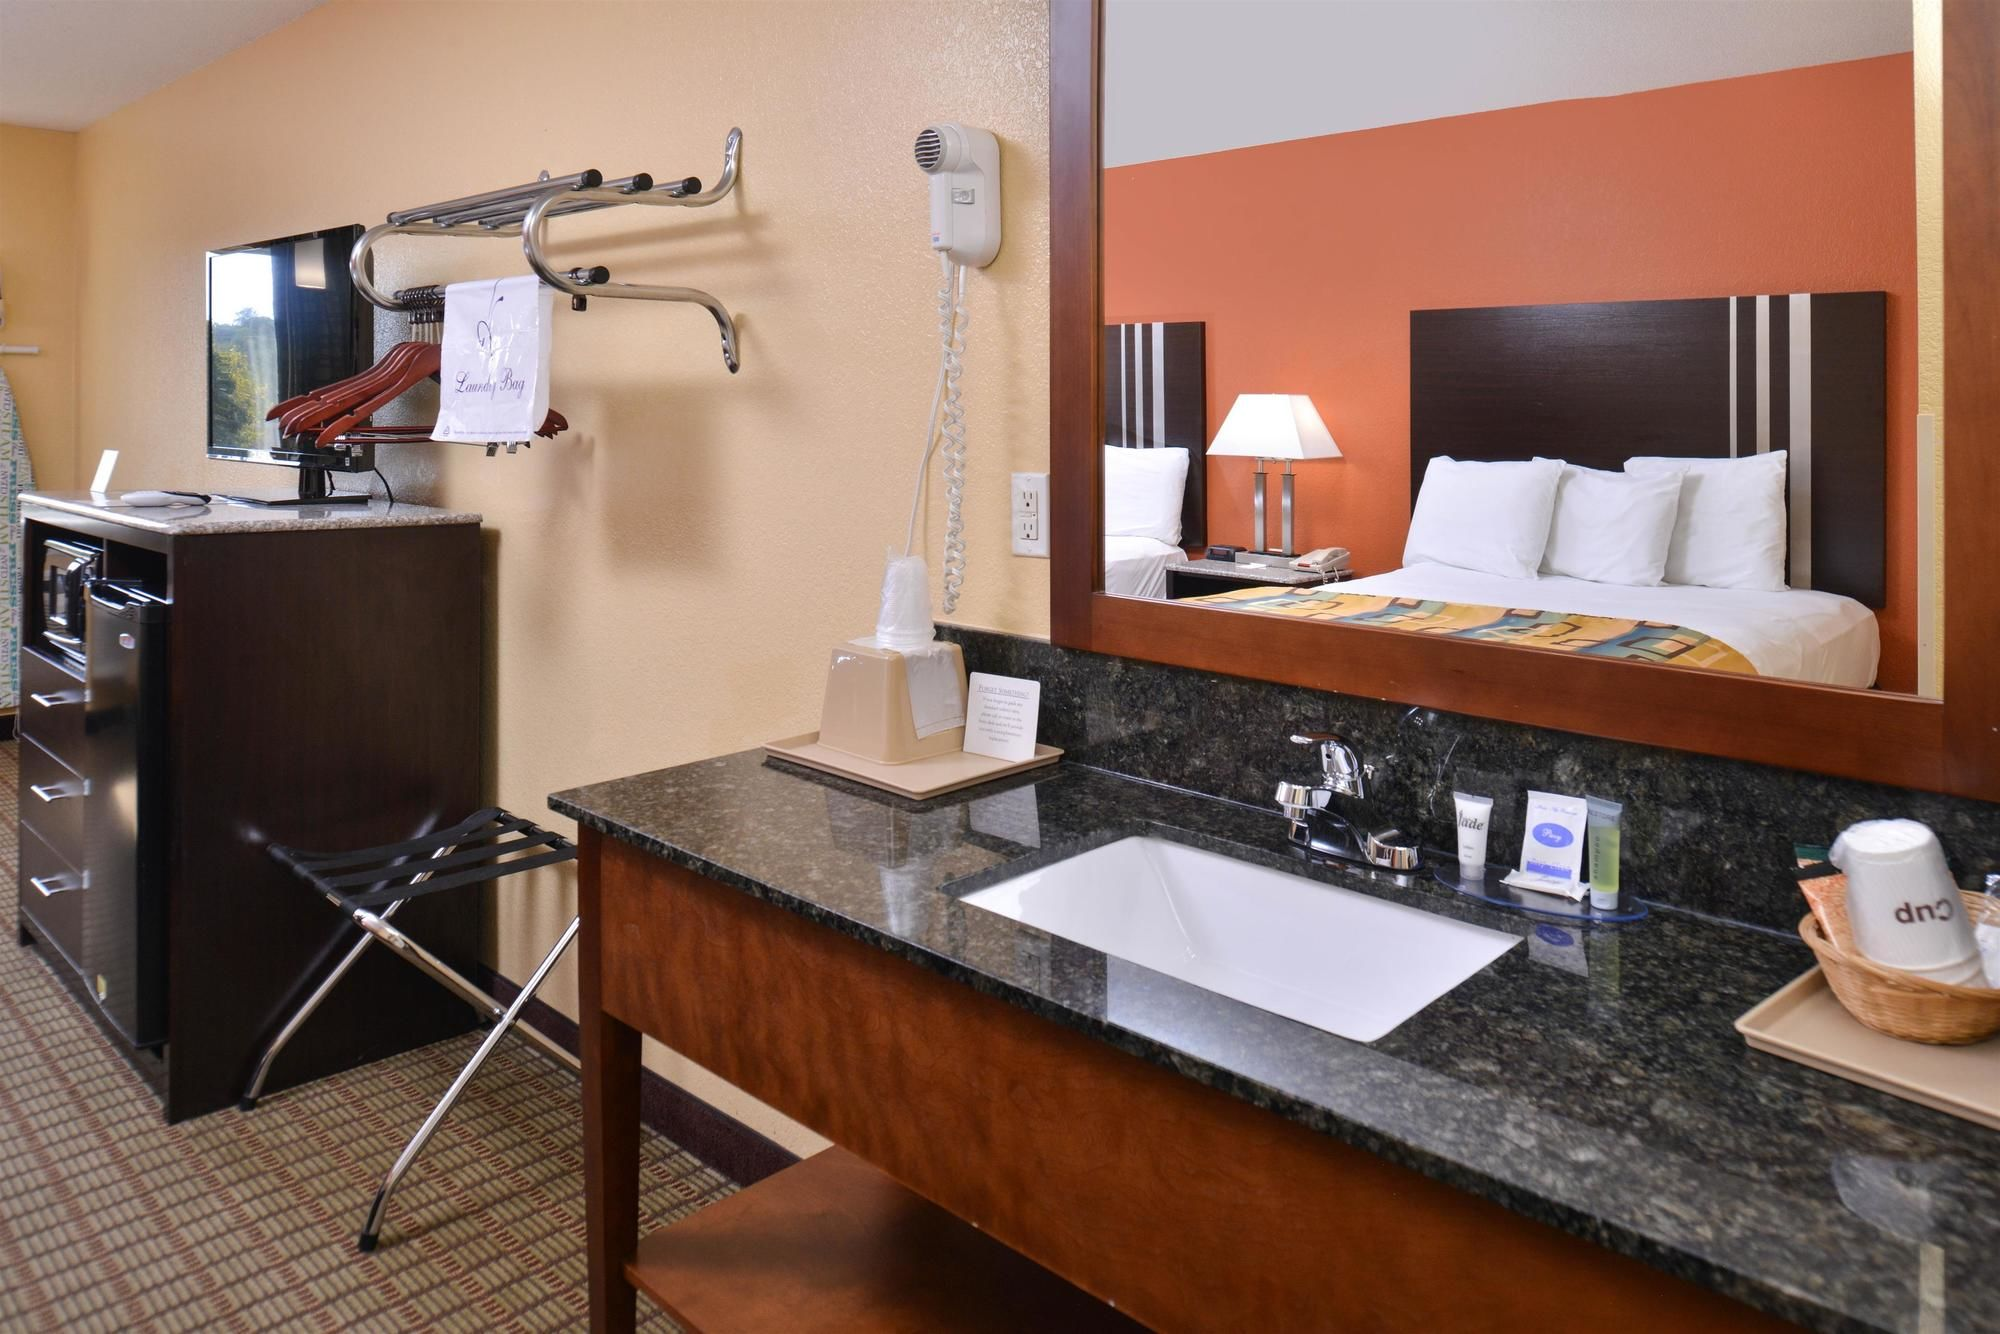 Douglas Inn & Suites in Cleveland, TN